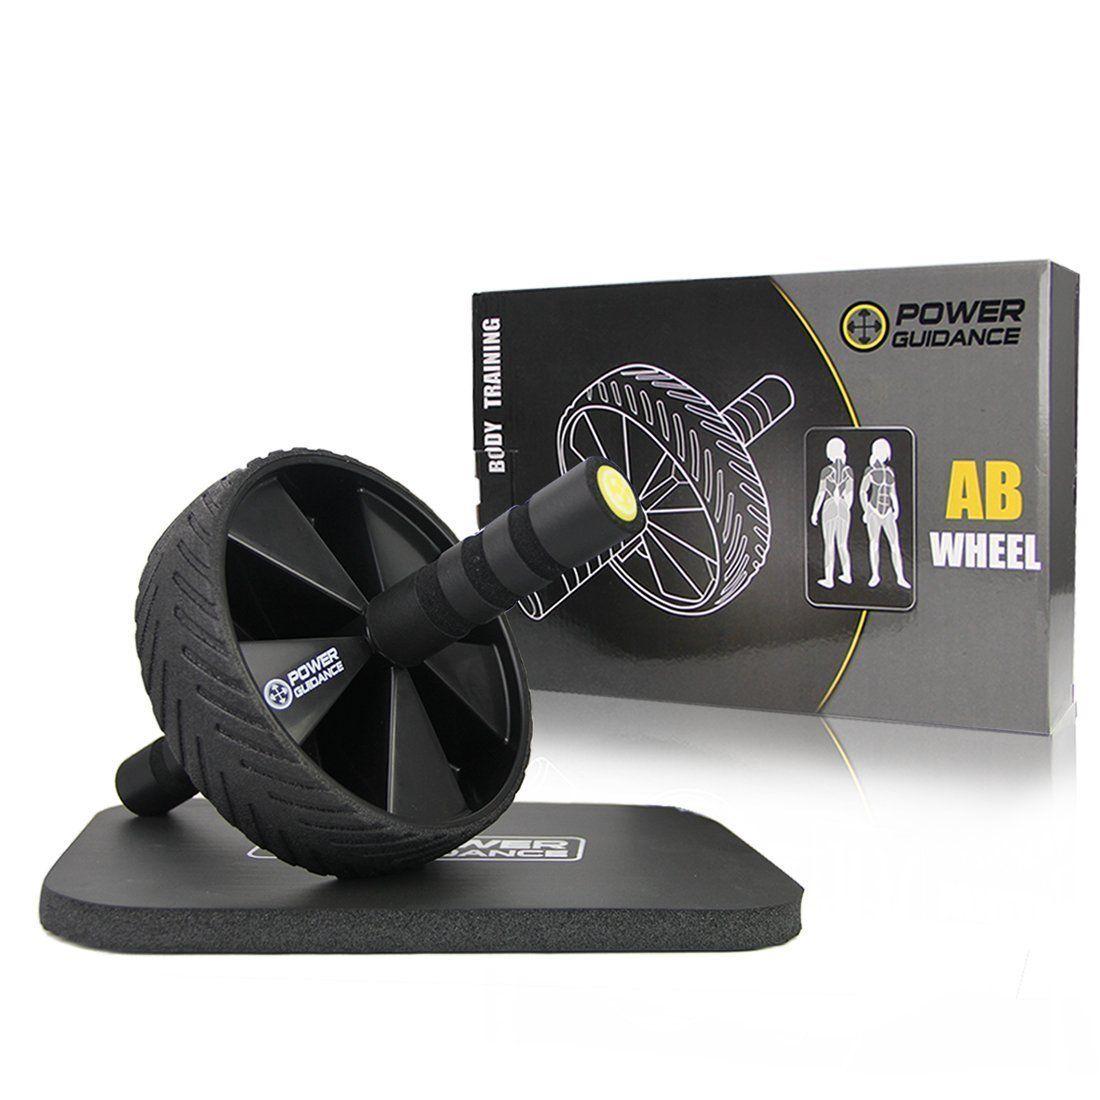 Power Guidance Roue Abdominale Ab Wheel Roller Pro De Fitness Et